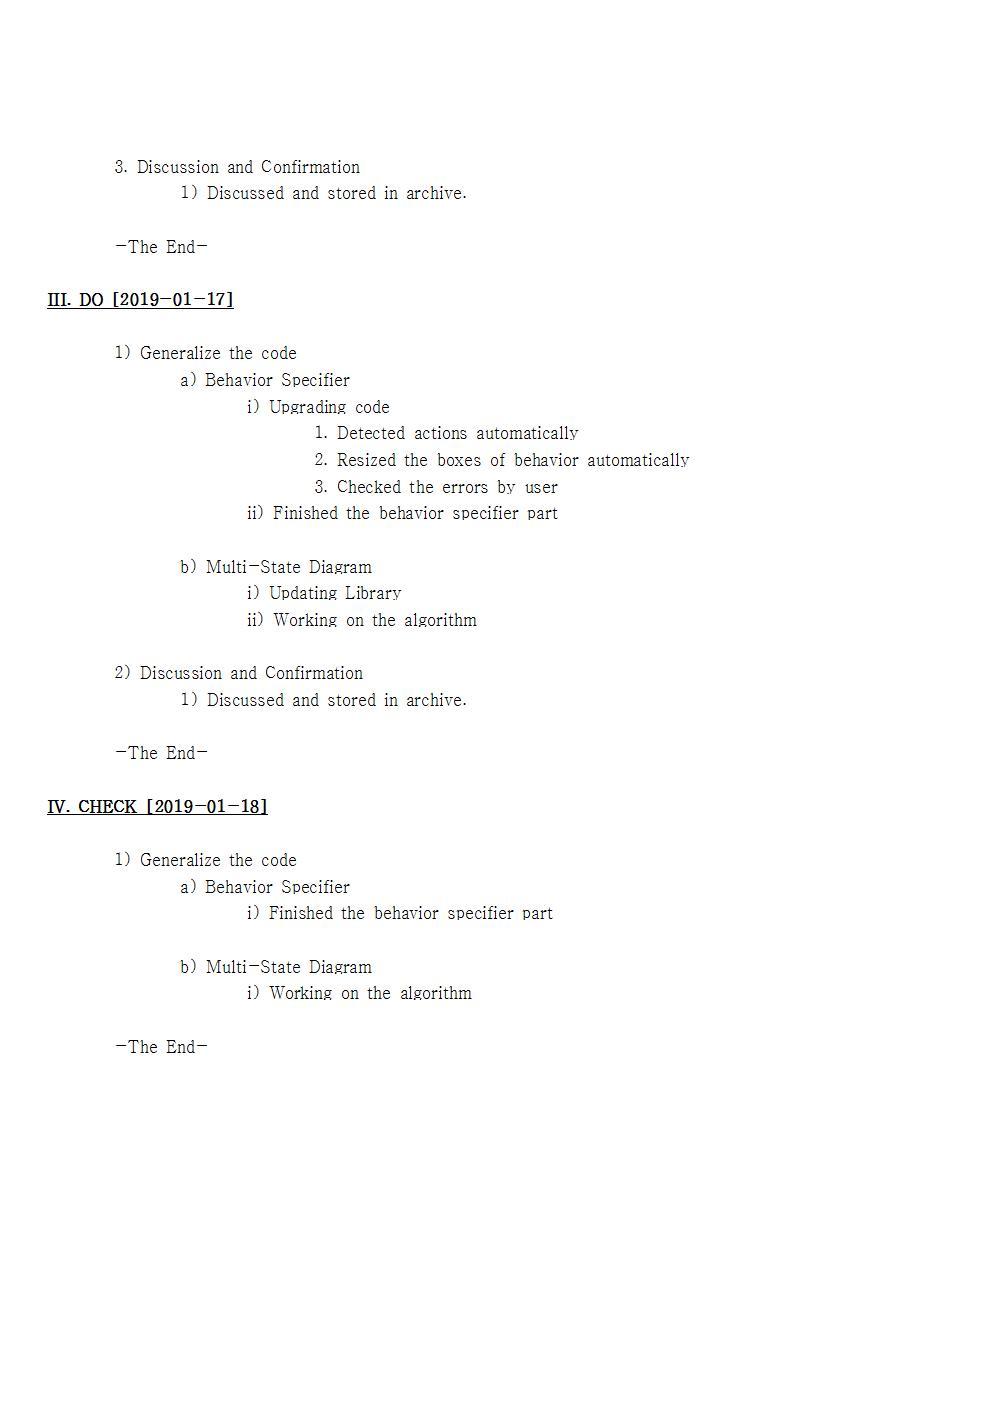 D-[19-002-RD-02]-[PRISM2.0-ADOxx]-[2019-01-18]-[MR]002.jpg